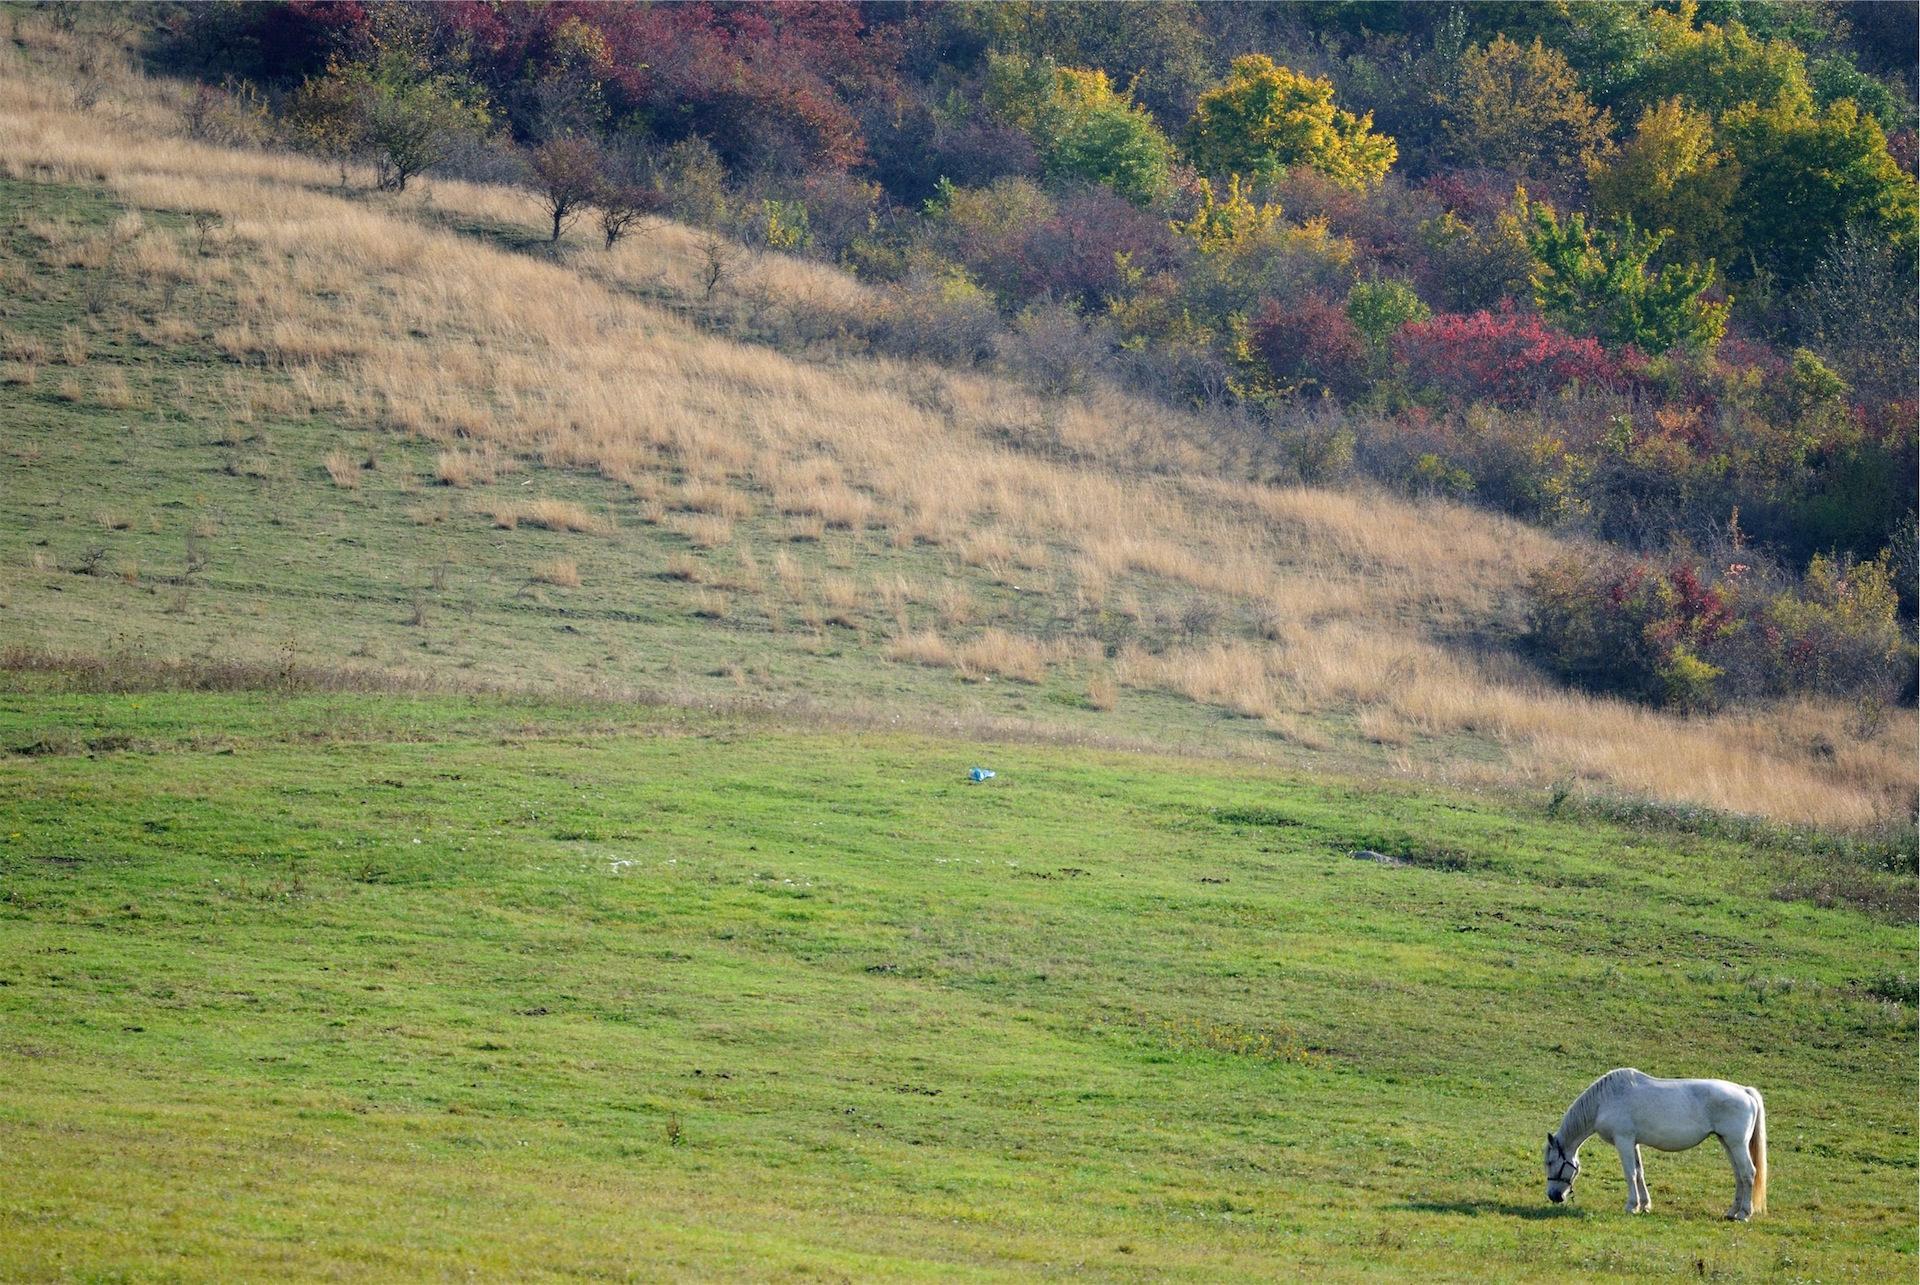 caballo, pradera, valle, lejanía, blanco - Fondos de Pantalla HD - professor-falken.com